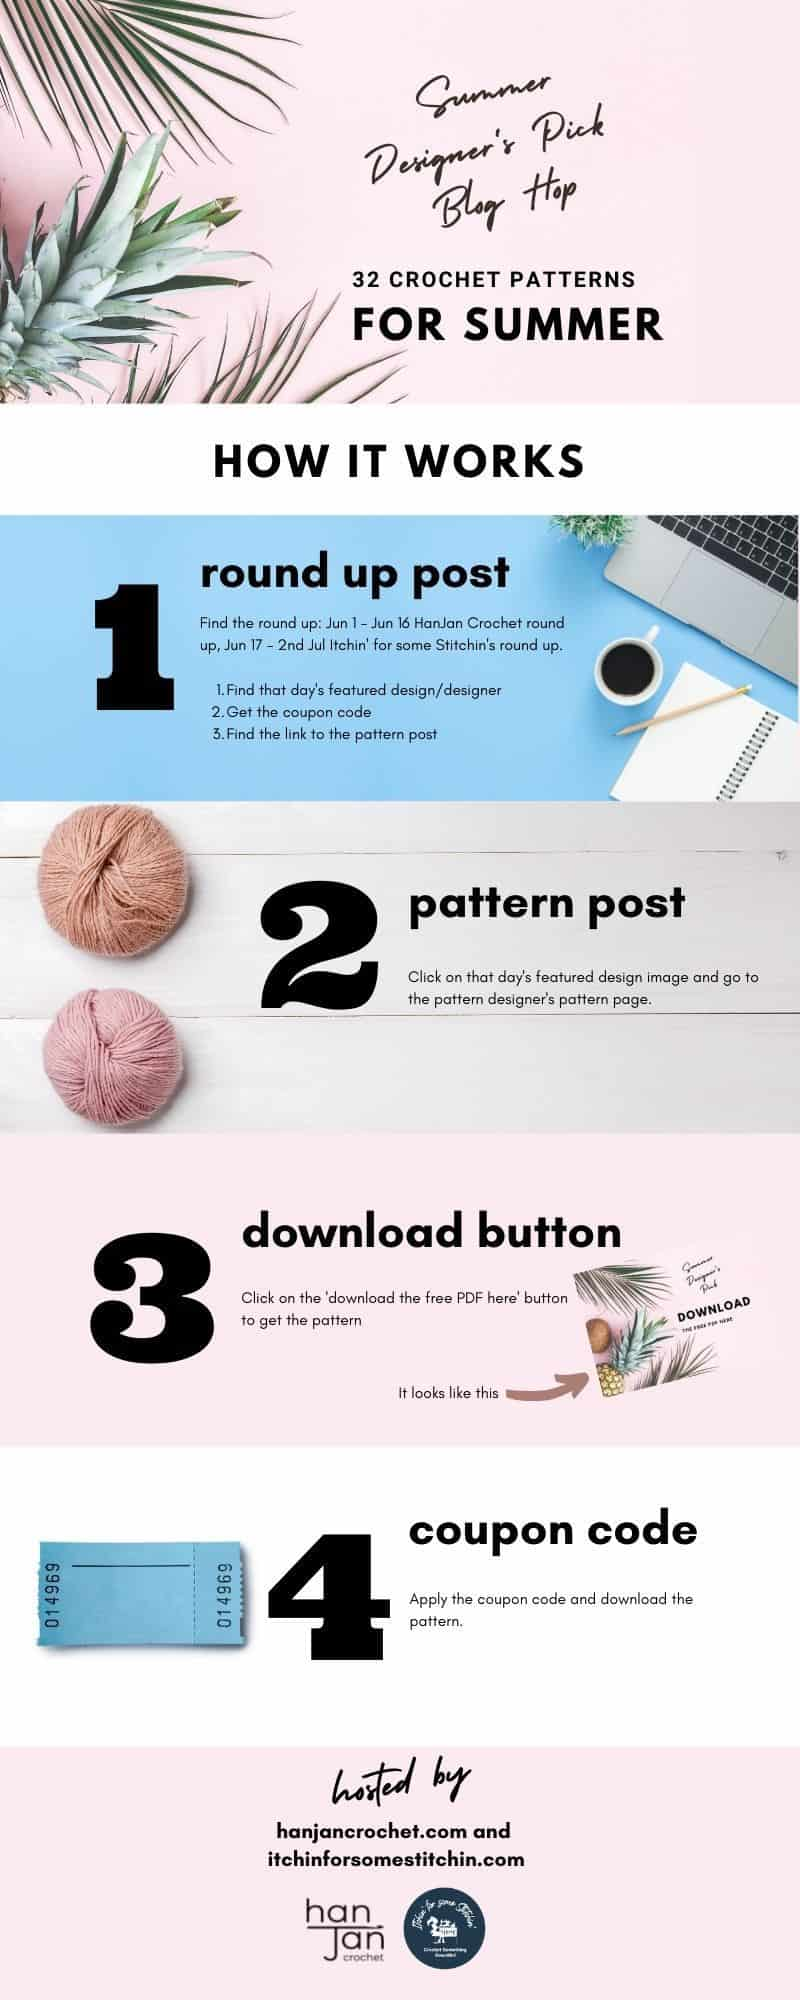 crochet blog hop infographic